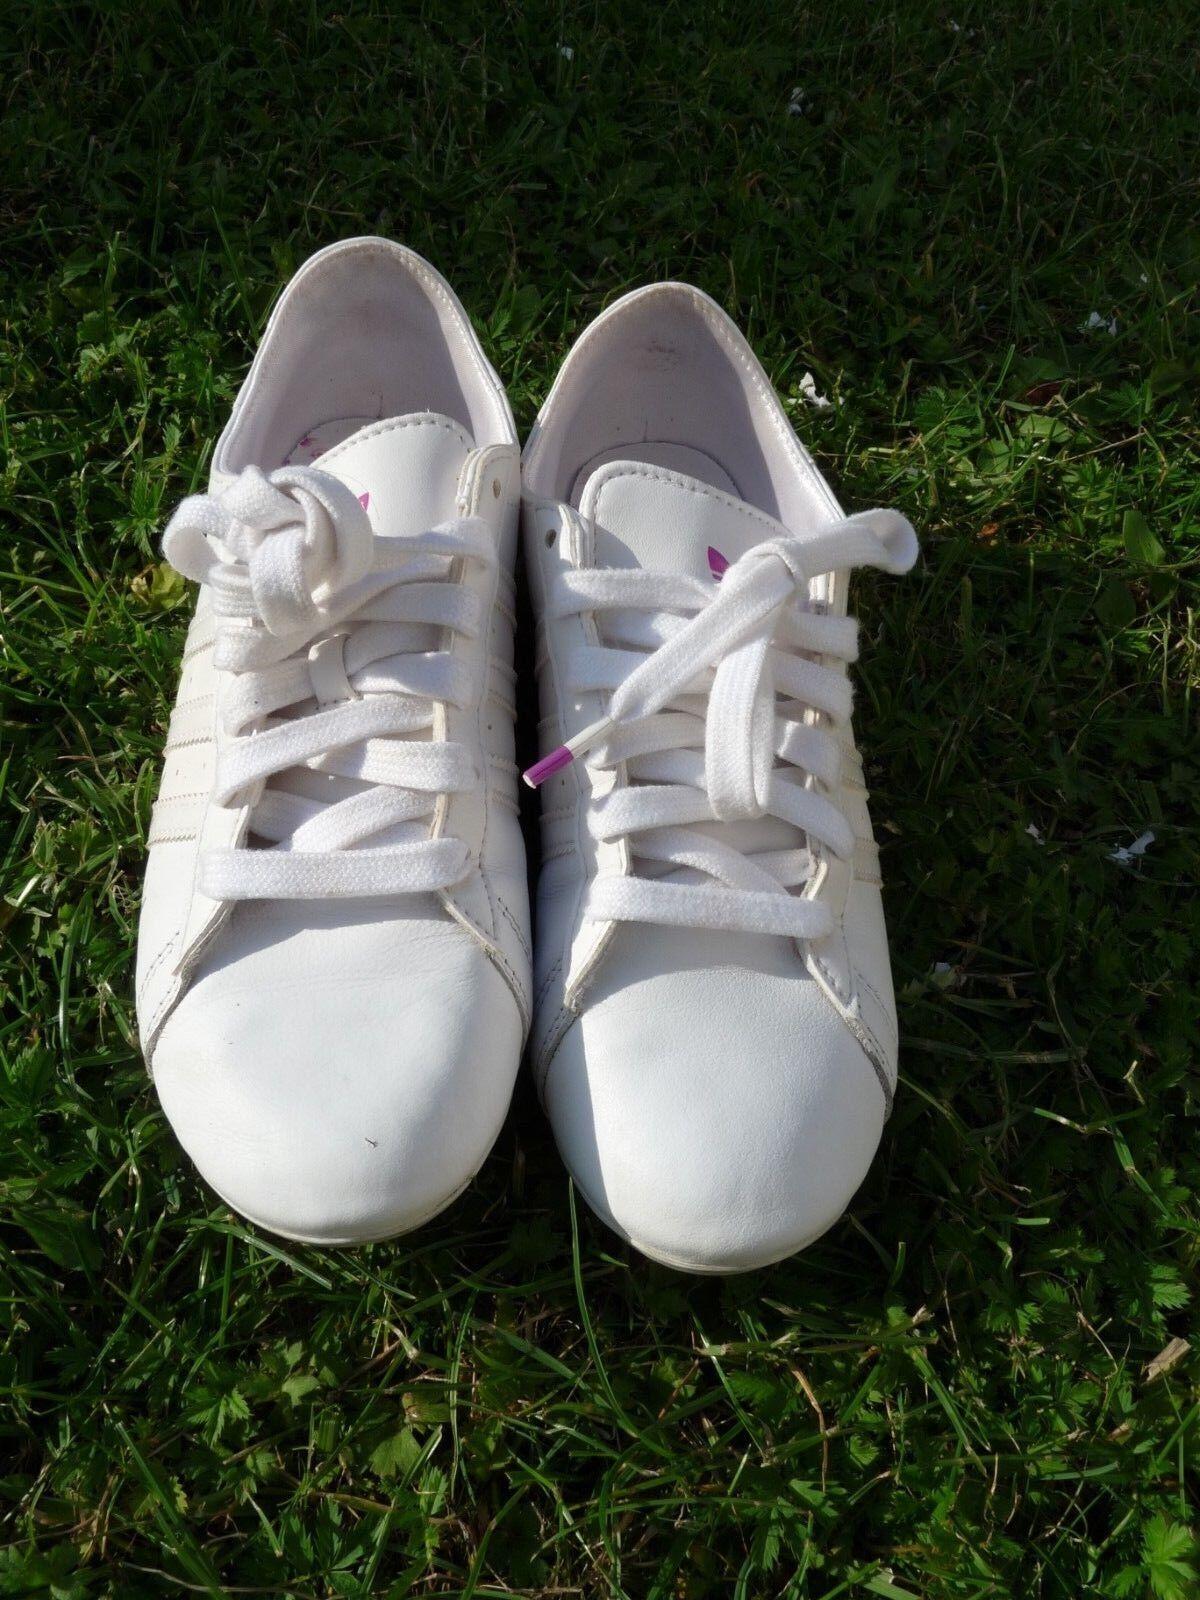 ADIDAS 38 Campus DP Round Sneaker Schuhe Gr. 38 ADIDAS weiß super Zustand RAR 8b258d